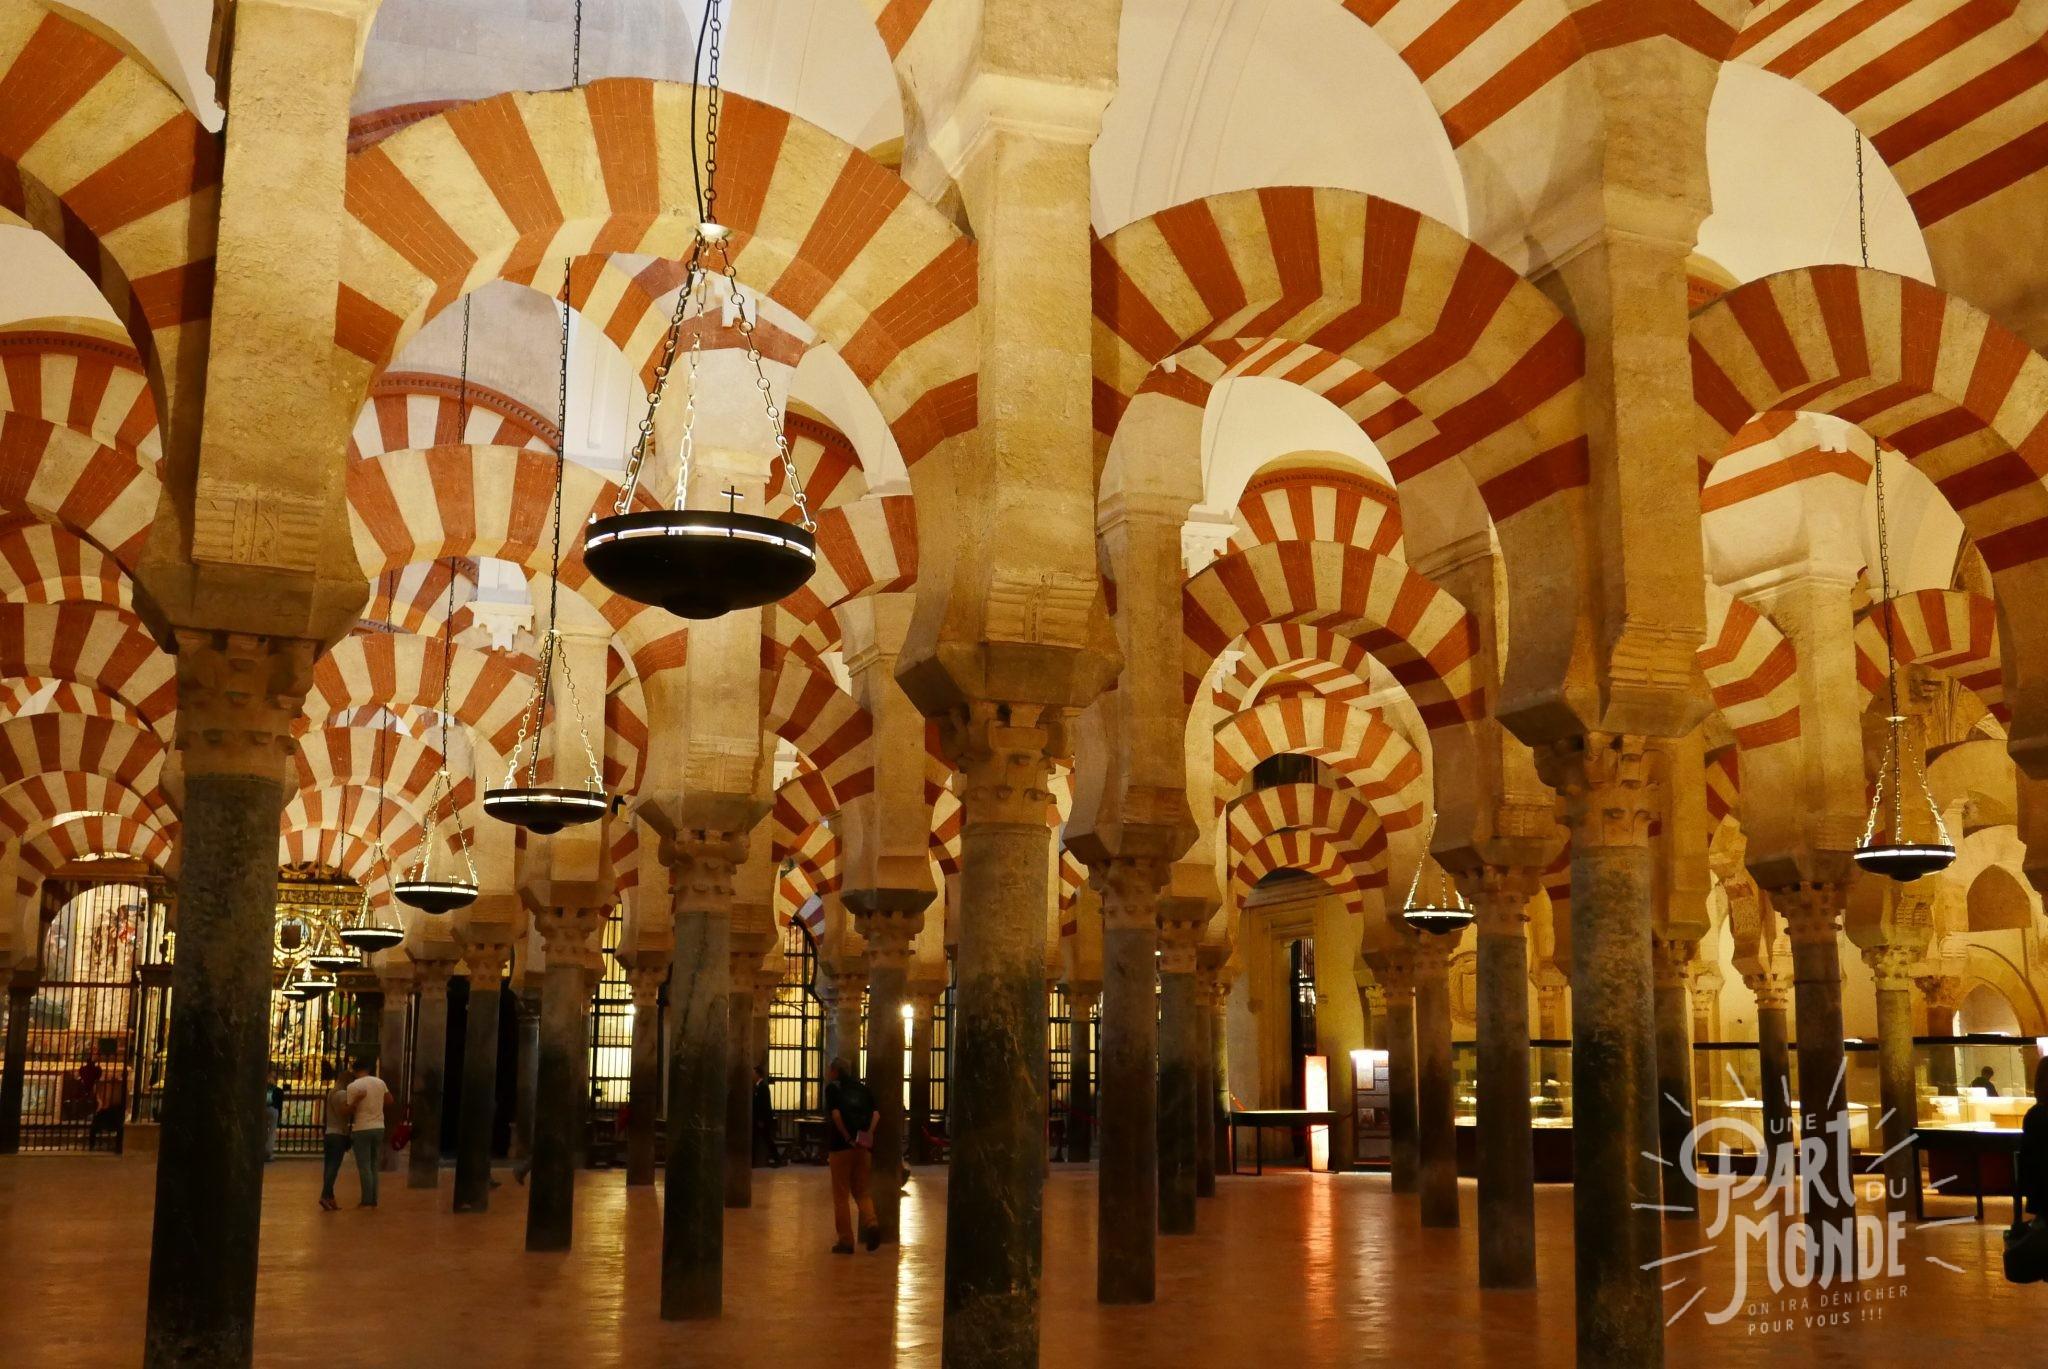 mezquita 13 cordoue